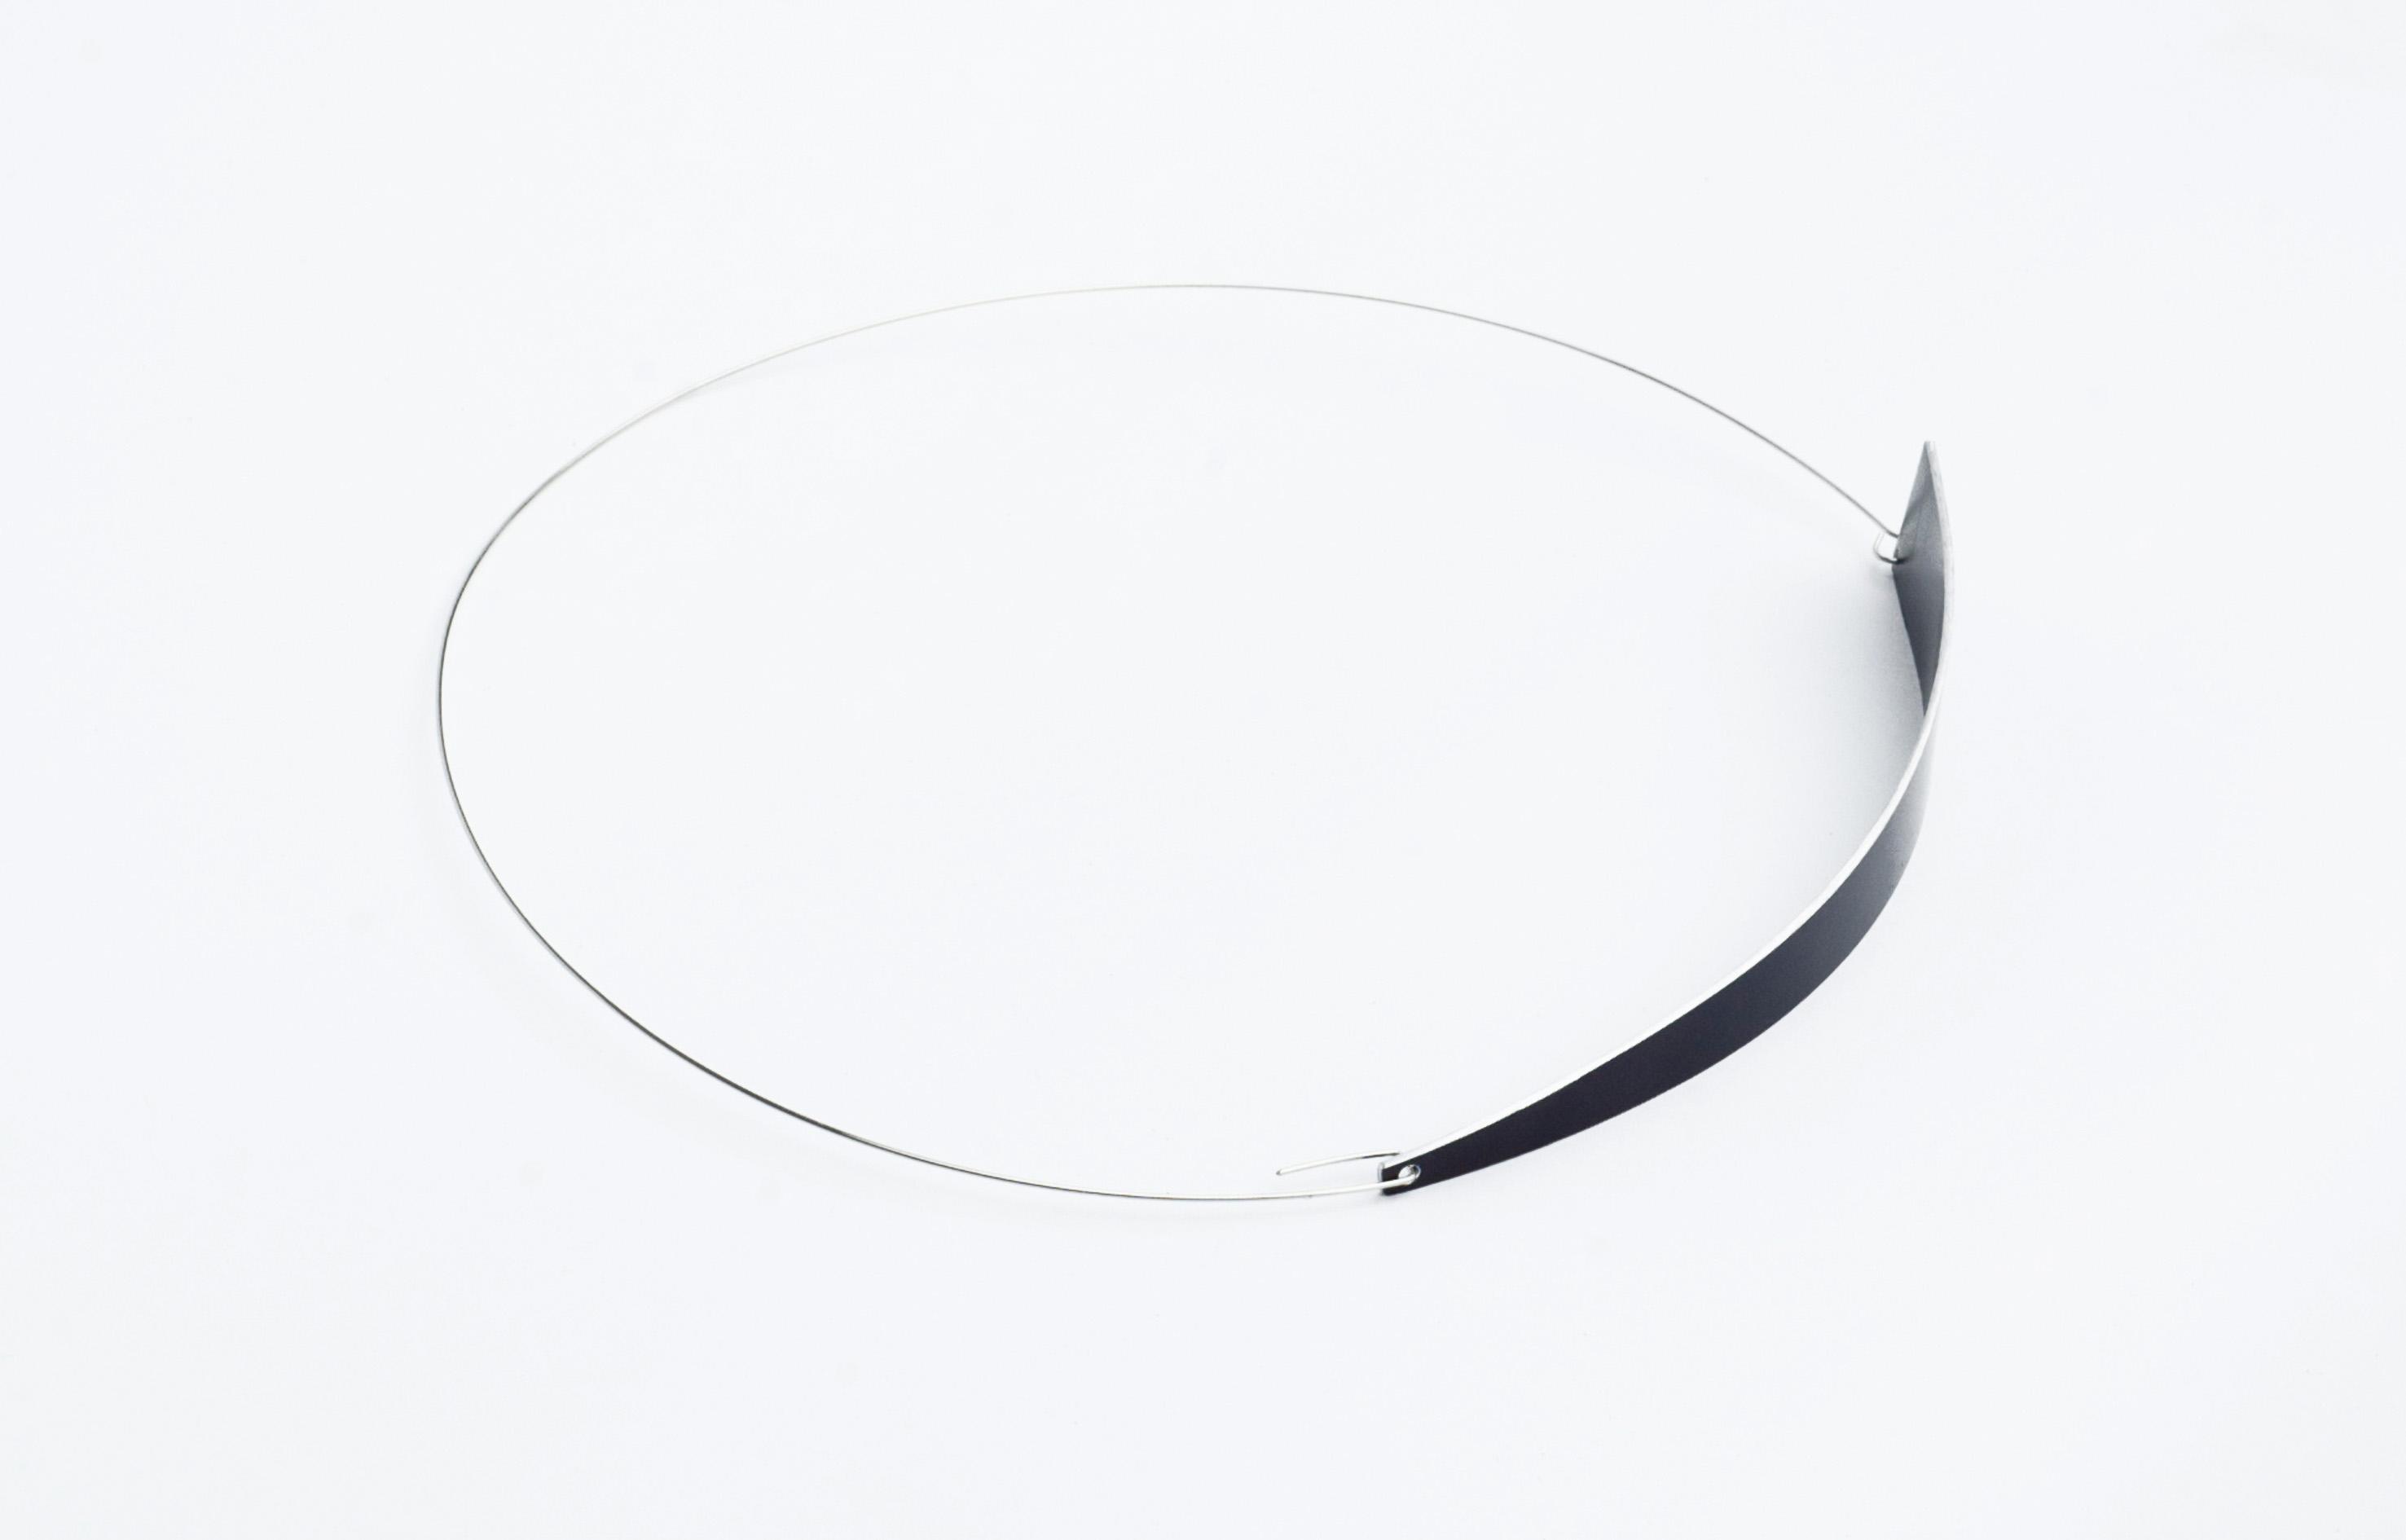 PPizani_SIETE - SEVEN Necklace